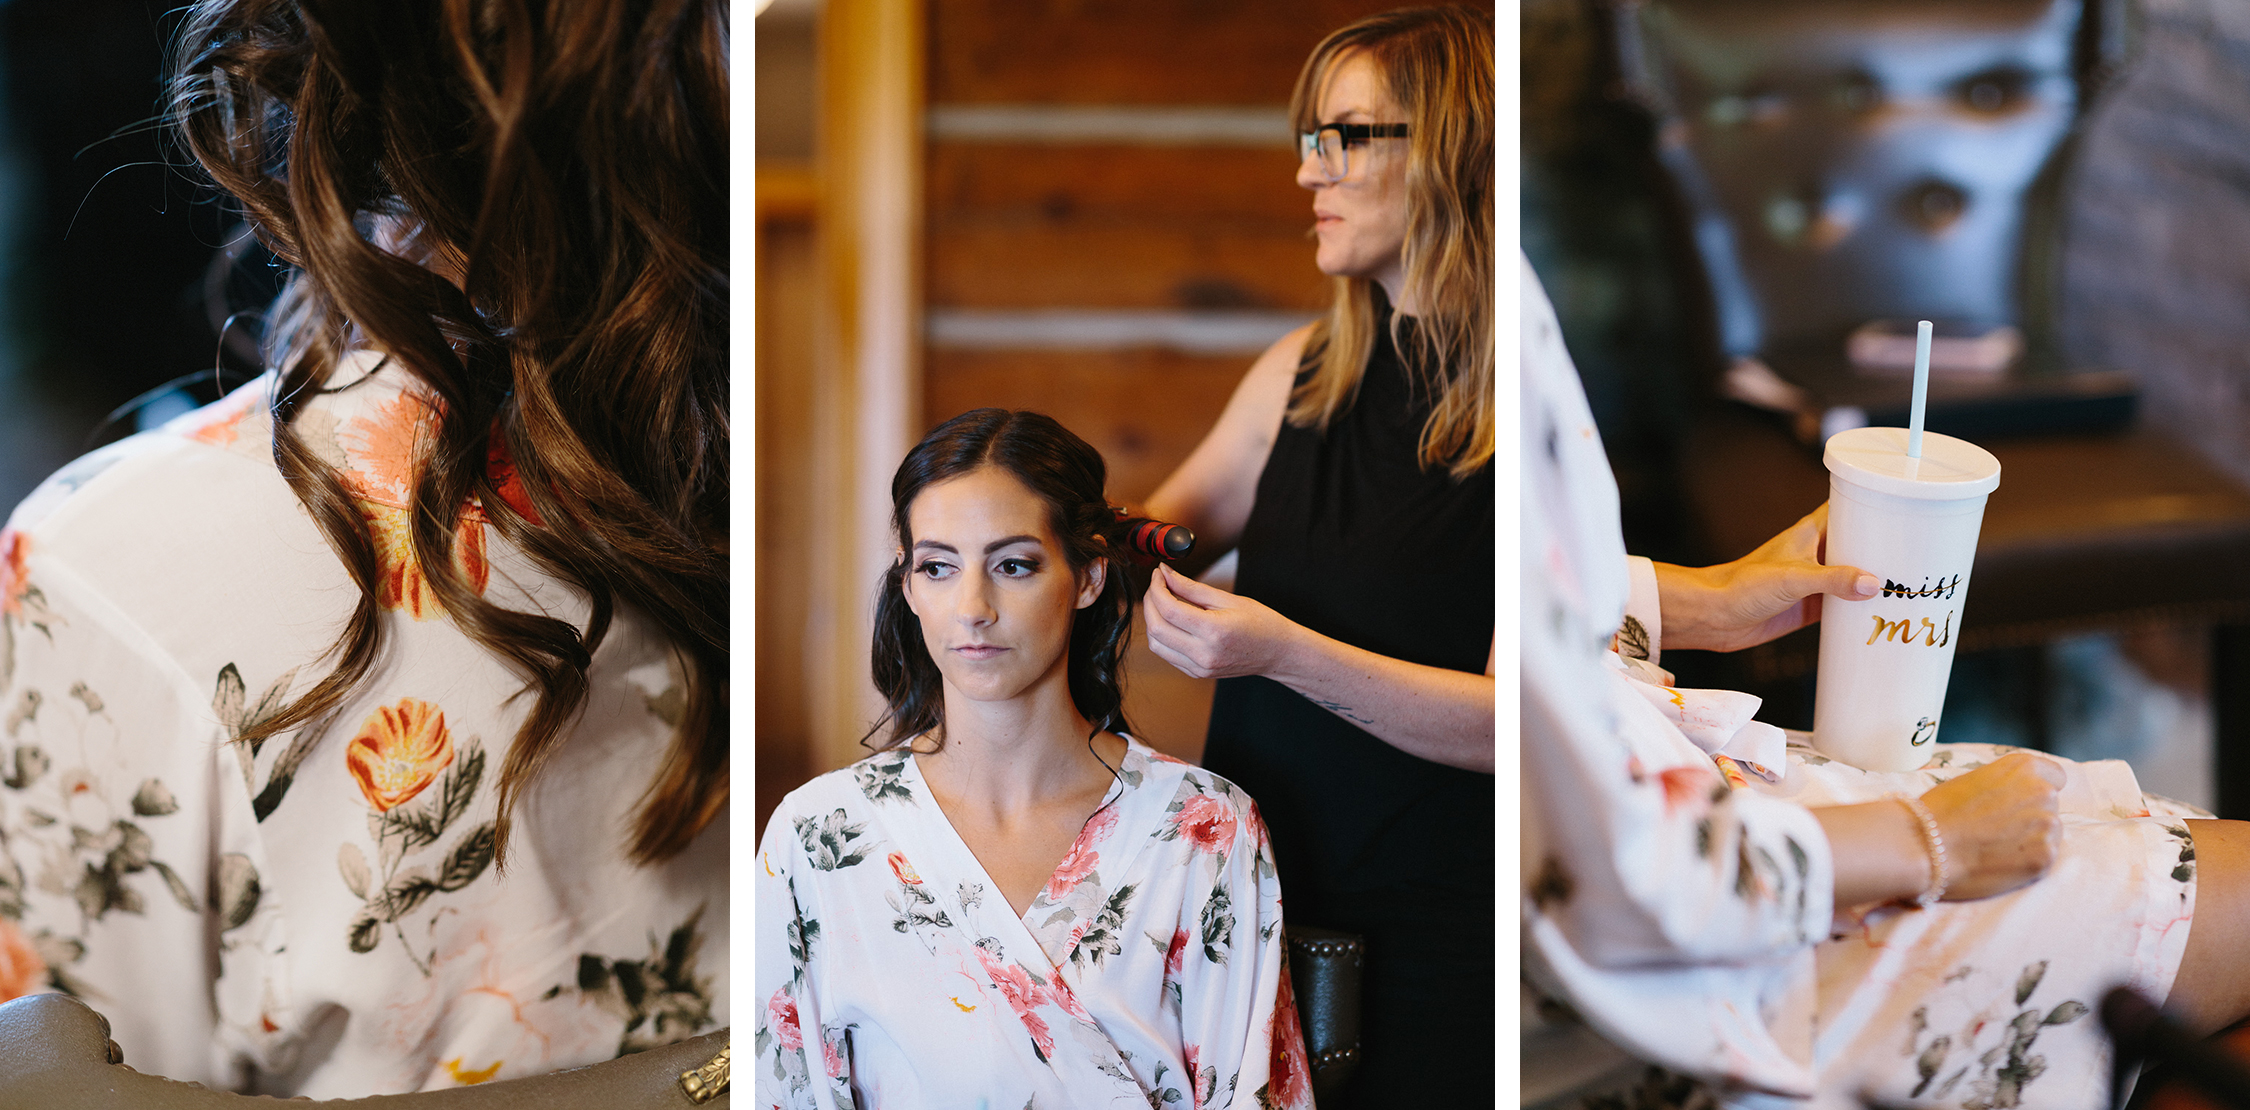 22-Bride-Getting-Ready-At-Egaridge-Resort-Venue-Muskoka-Ontario-.jpg